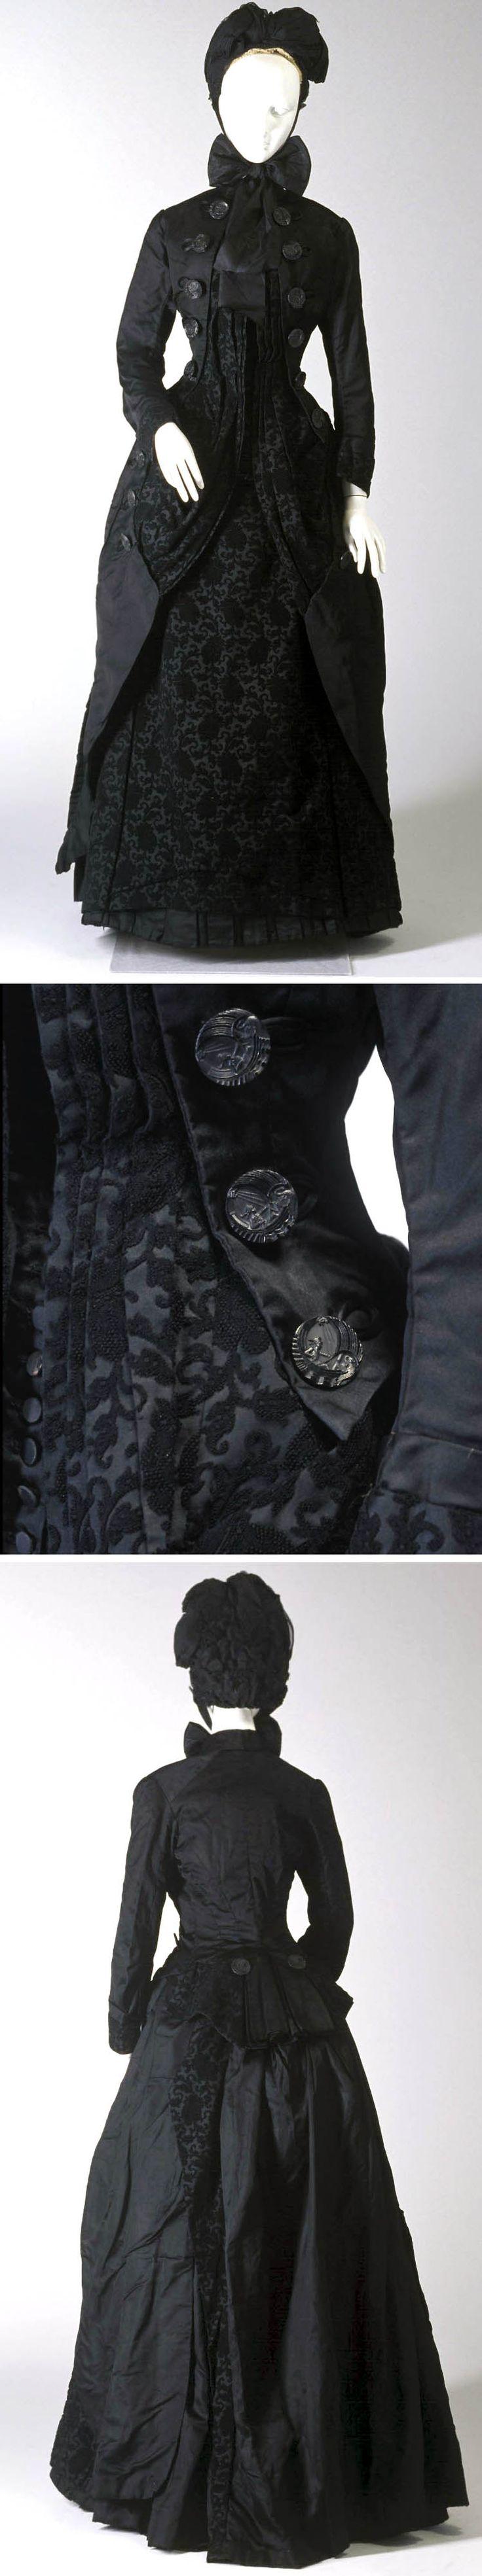 Mourning ensemble, ca. 1885. Silk jacket, bodice, and skirt. Powerhouse Museum